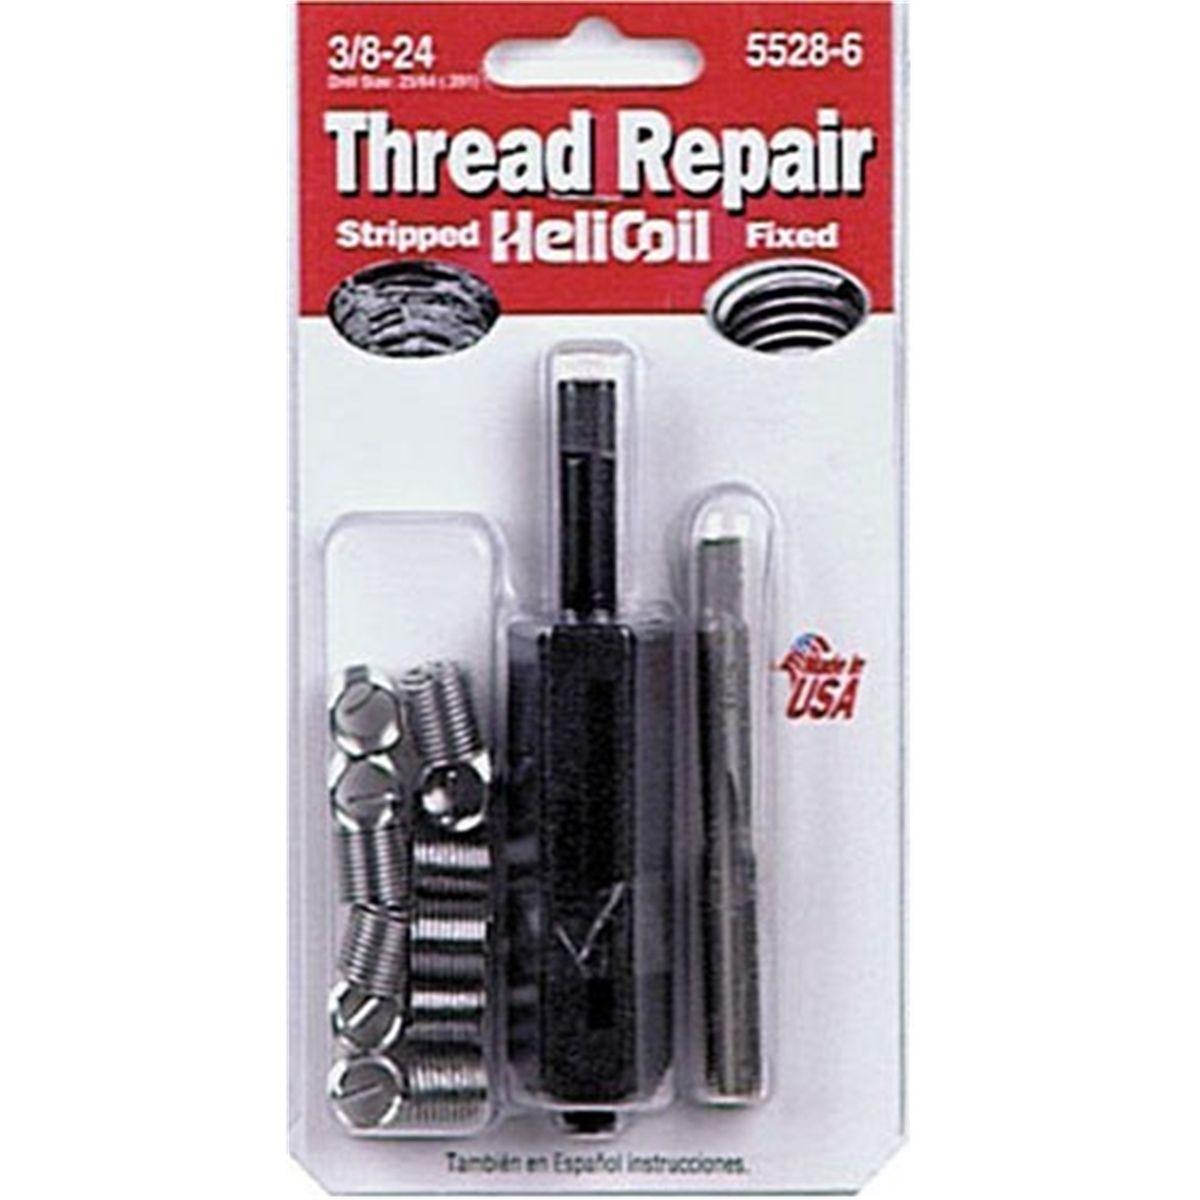 Helicoil 5528-6 3//8-24 Inch Fine Thread Repair Kit